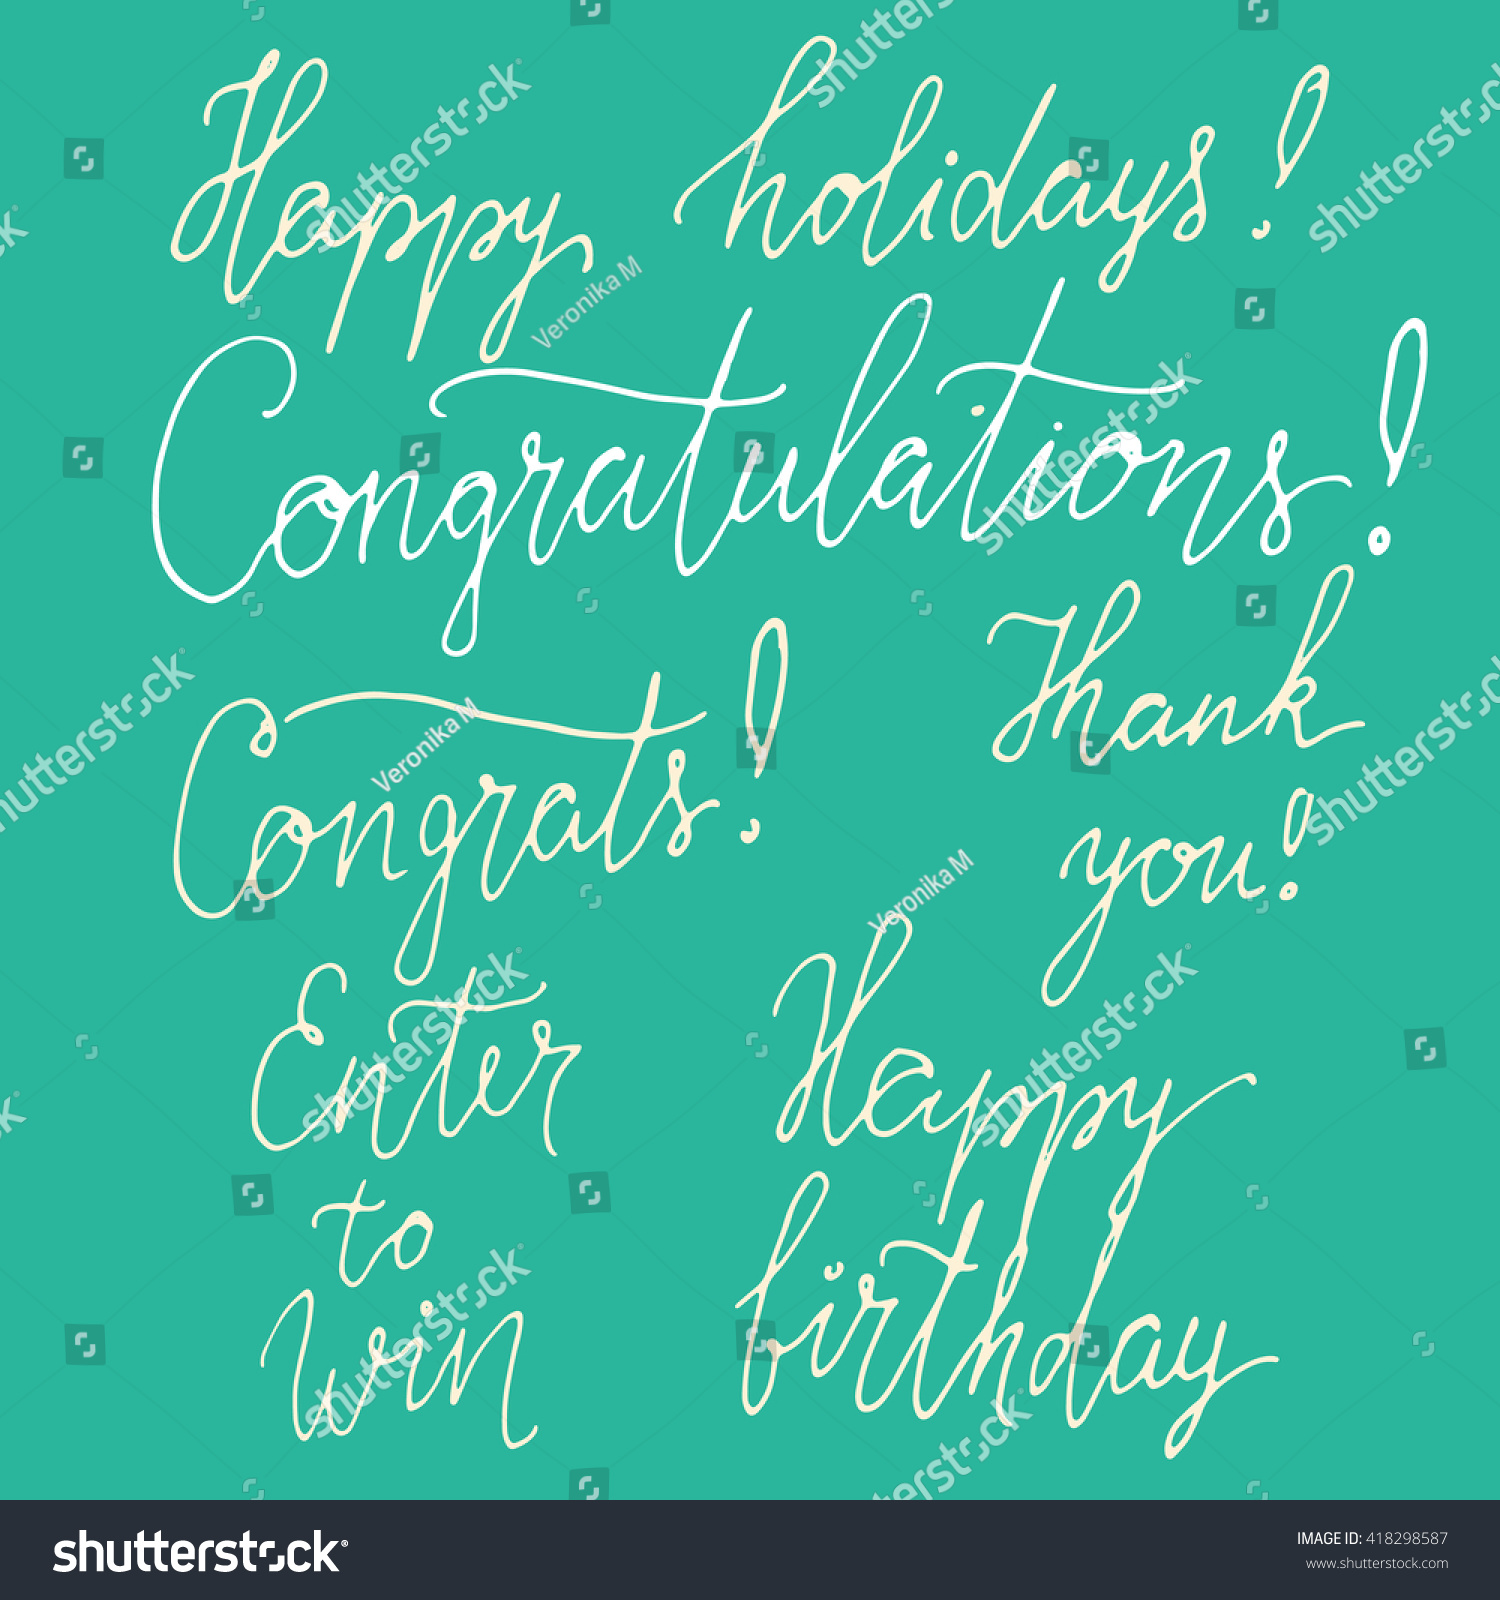 set congratulation signs happy birthday card stock vector set of congratulation signs happy birthday card enter to win vector hand drawn